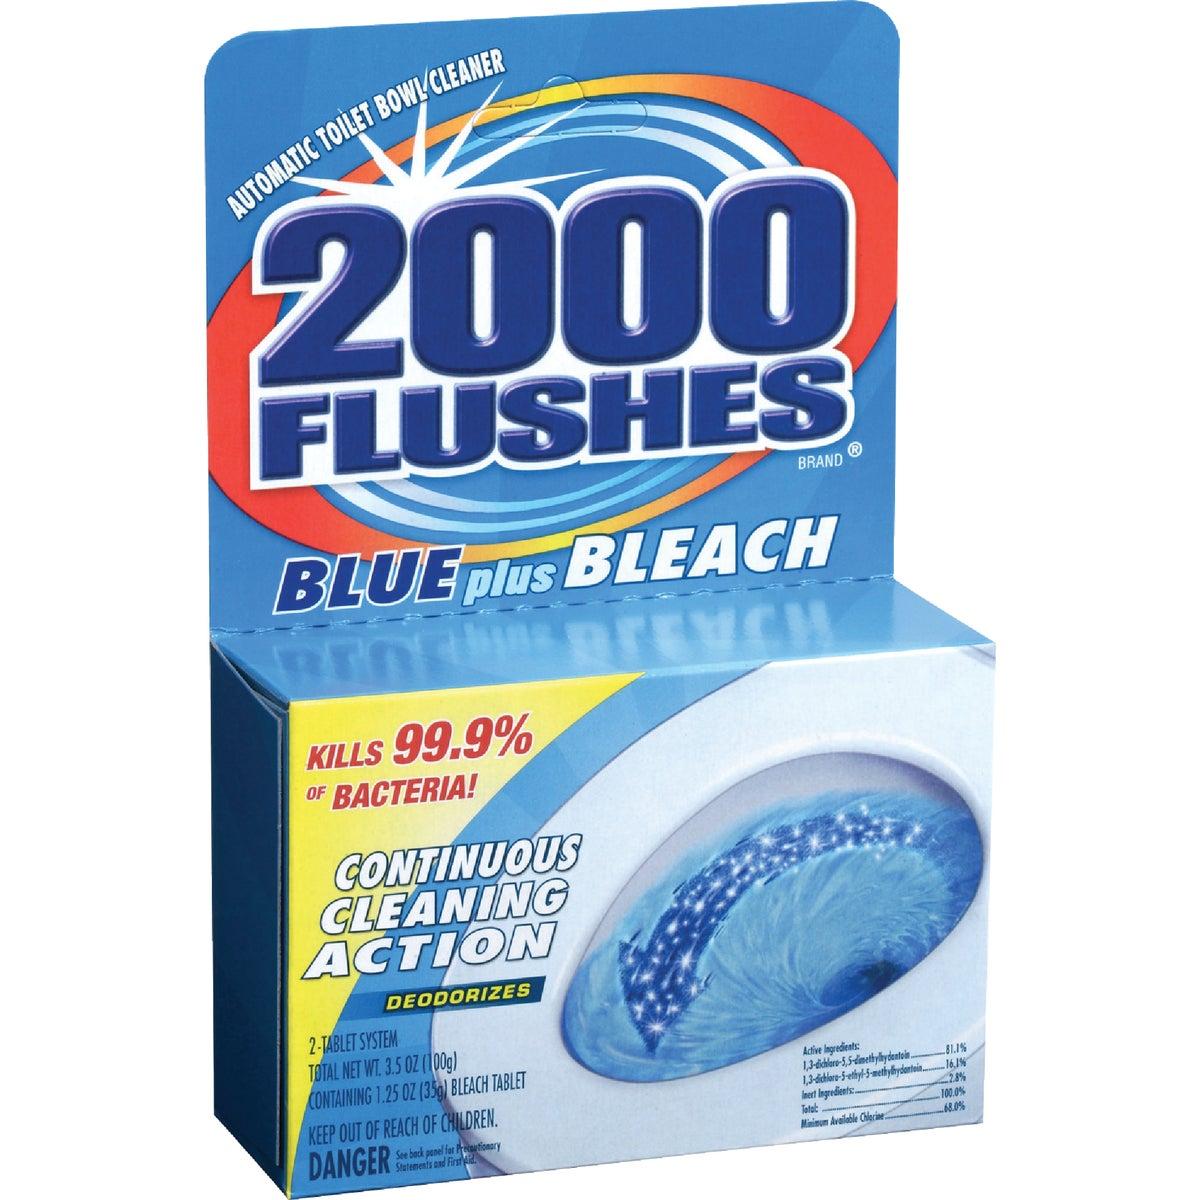 2000 Flushes Blue Plus Bleach Automatic Toilet Bowl Cleaner